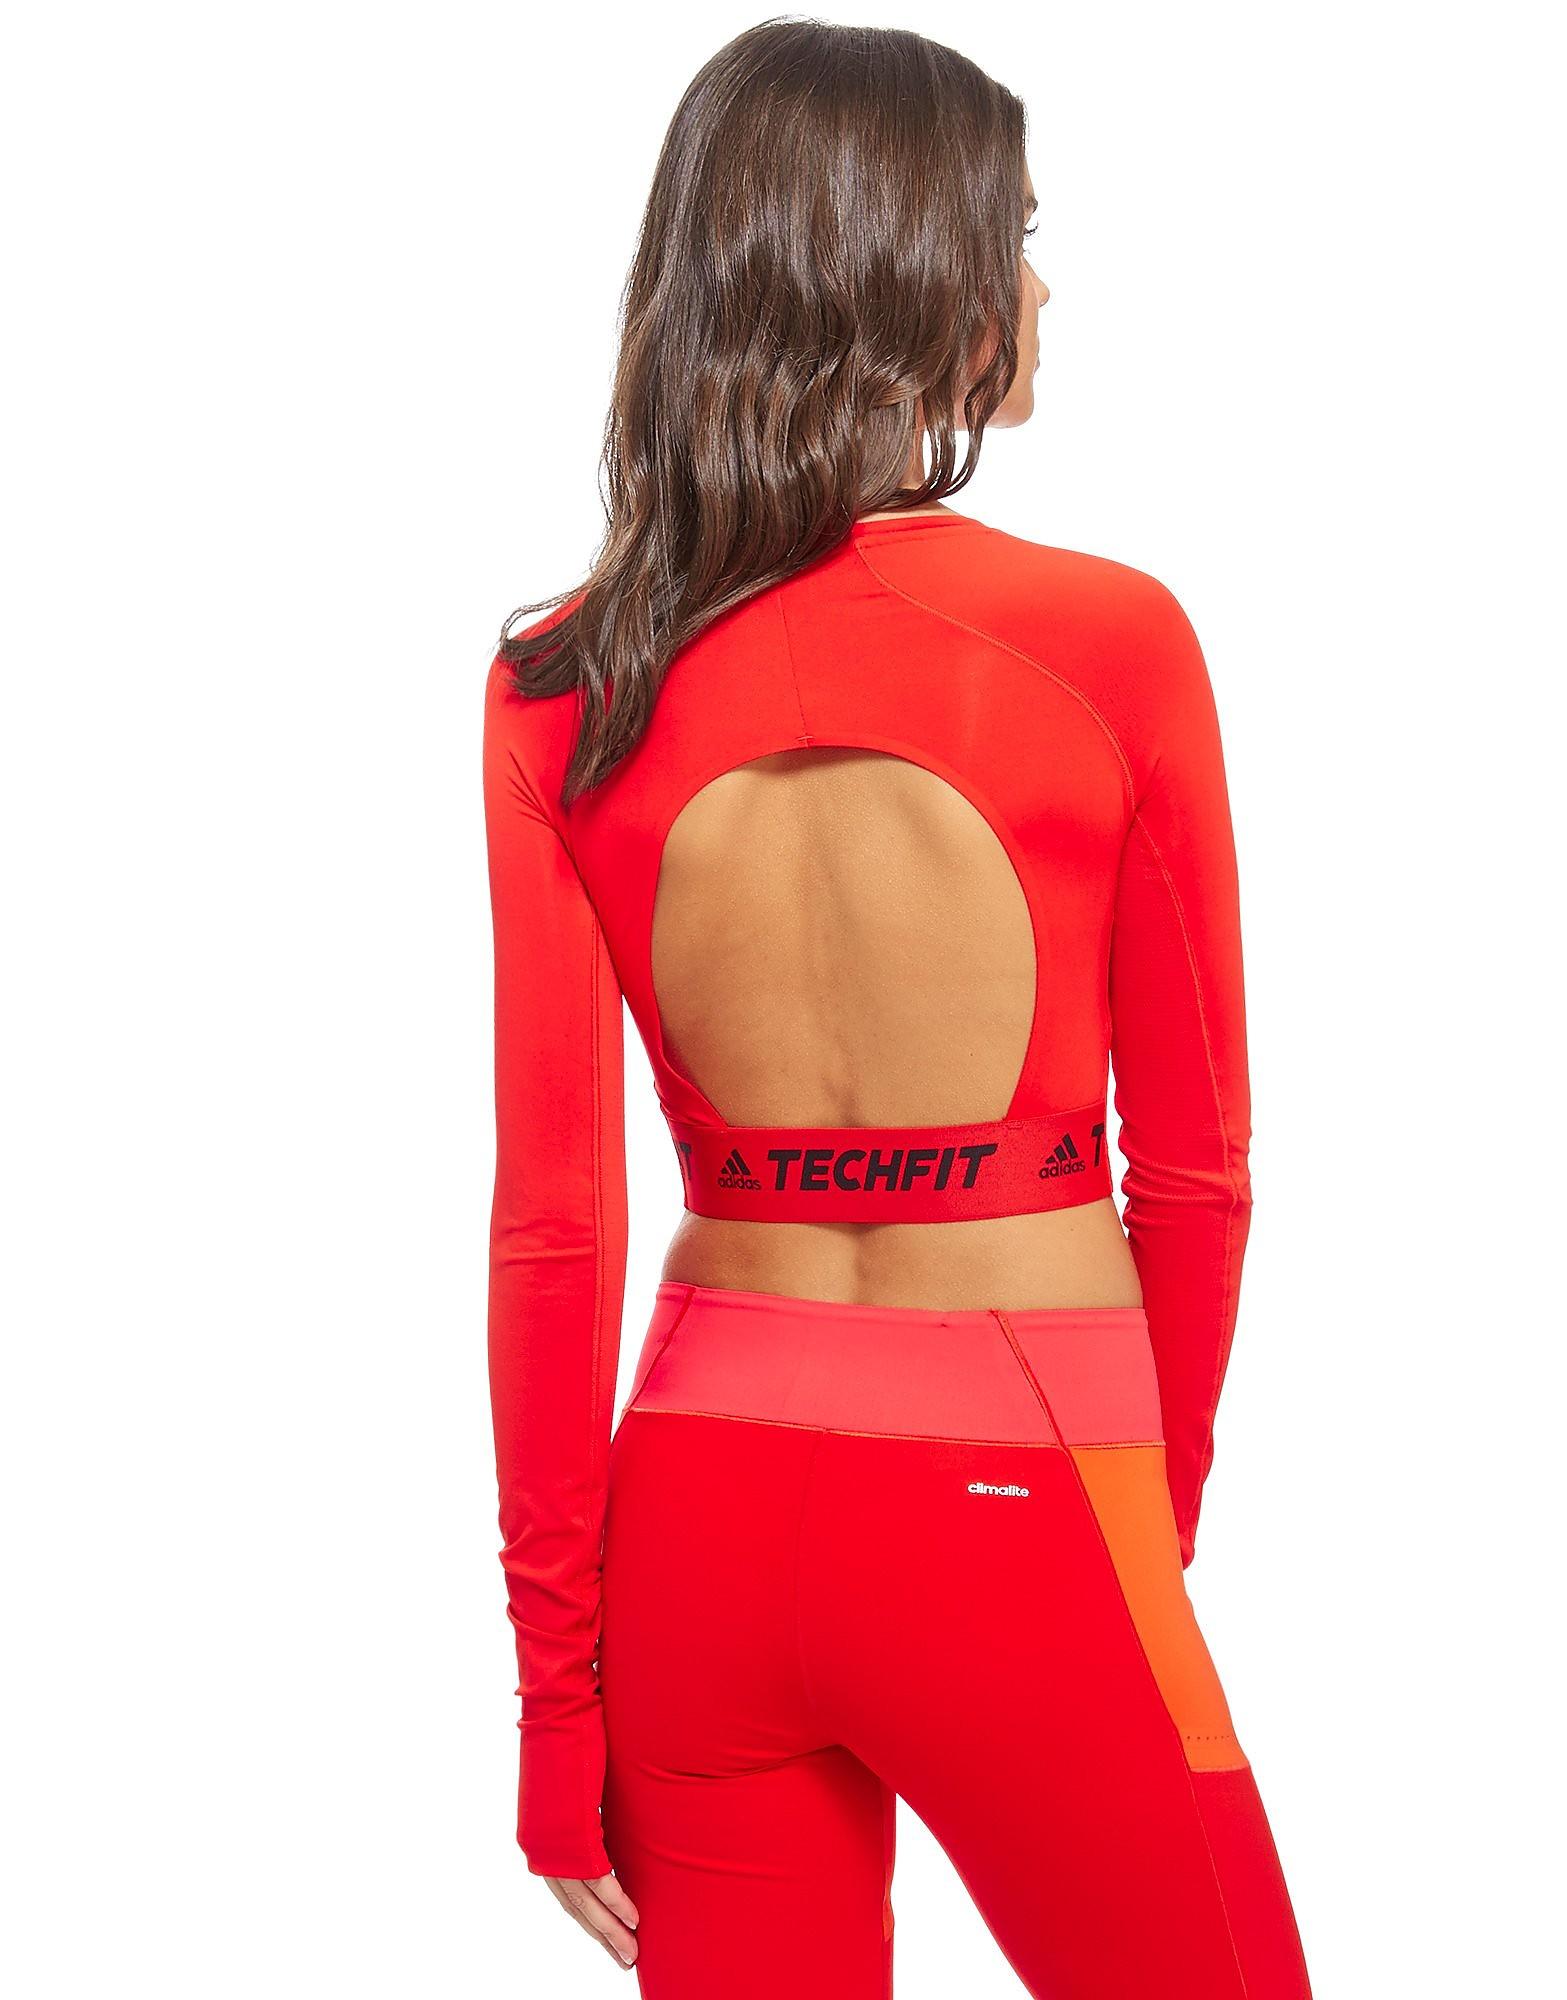 adidas Techfit Long Sleeve Crop Top